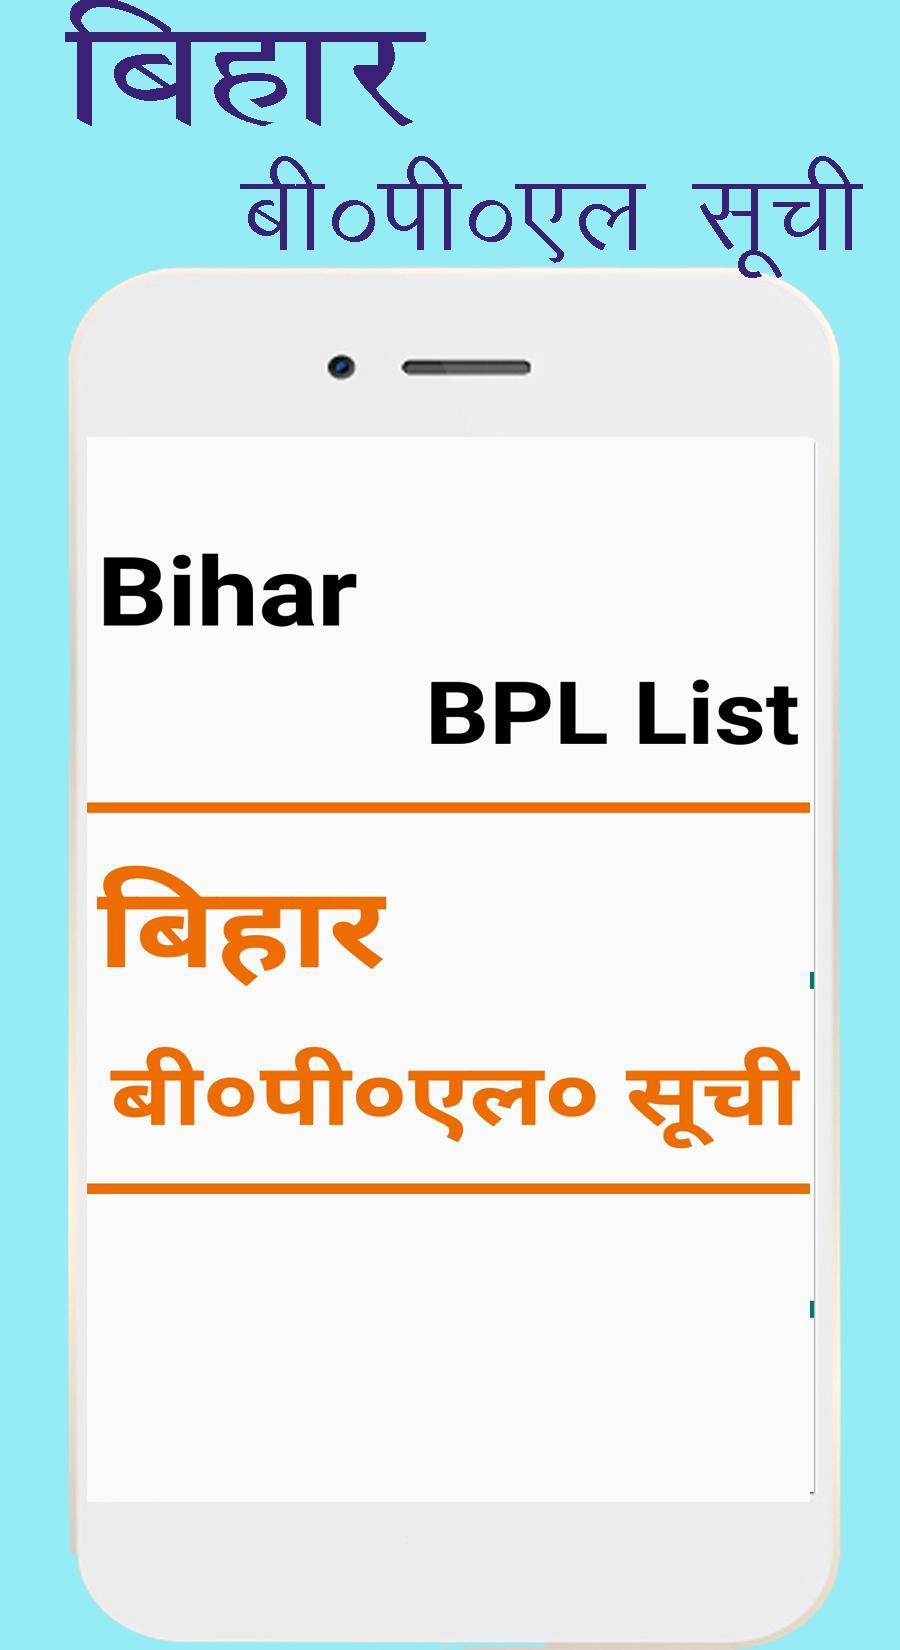 Bihar BPL List Online 2018 / Bihar BPL Card for Android